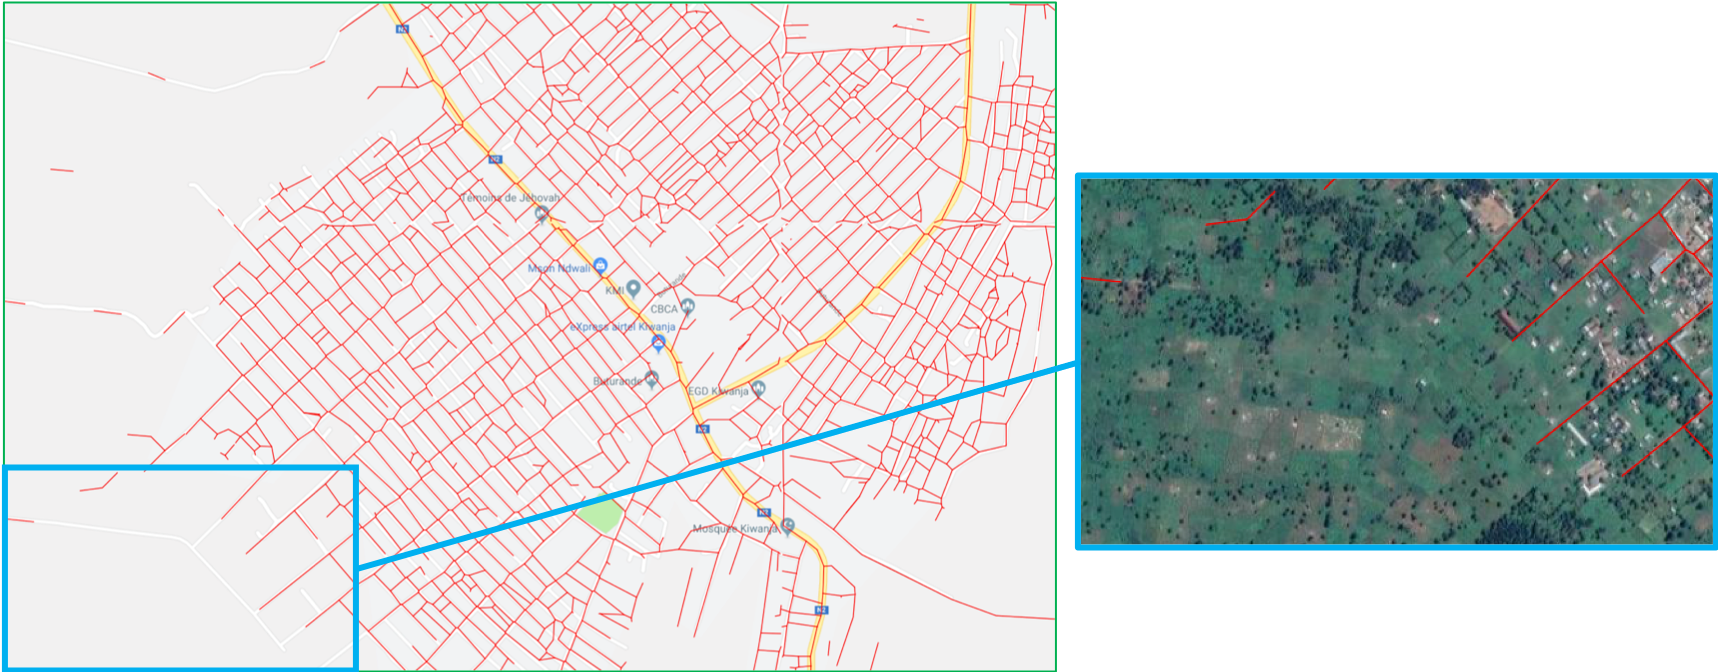 Orbital Insight road lines match OSM